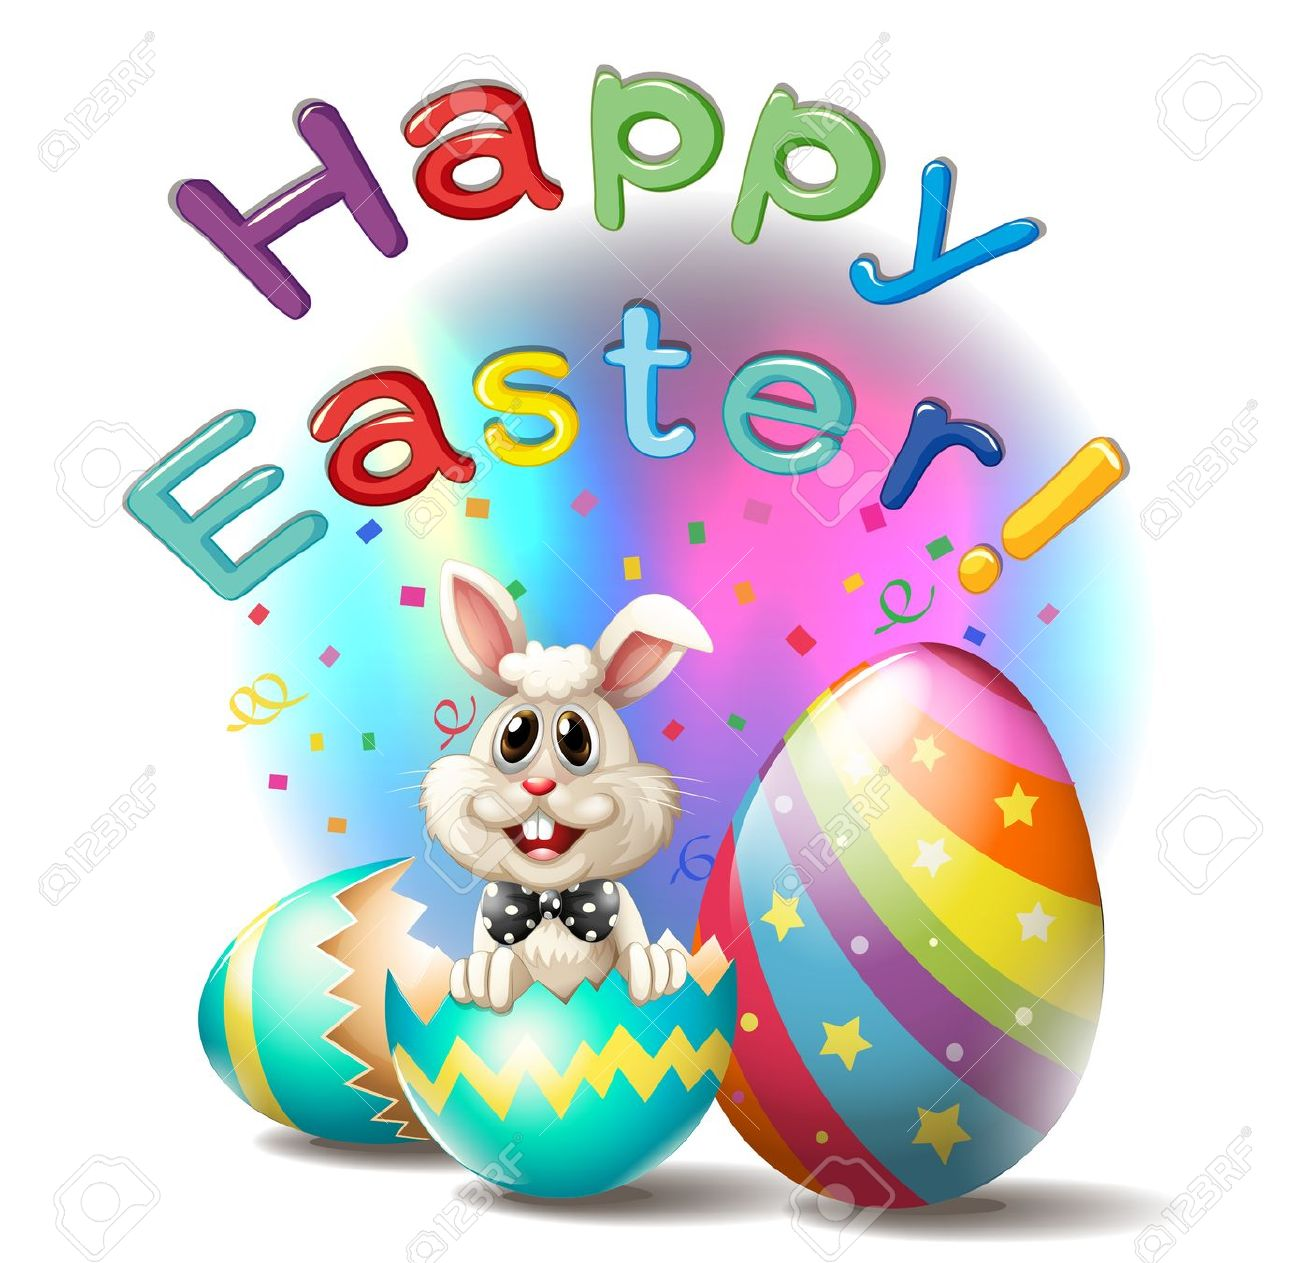 Cracked easter egg clipart jpg black and white 1,039 Cracked Egg Stock Vector Illustration And Royalty Free ... jpg black and white